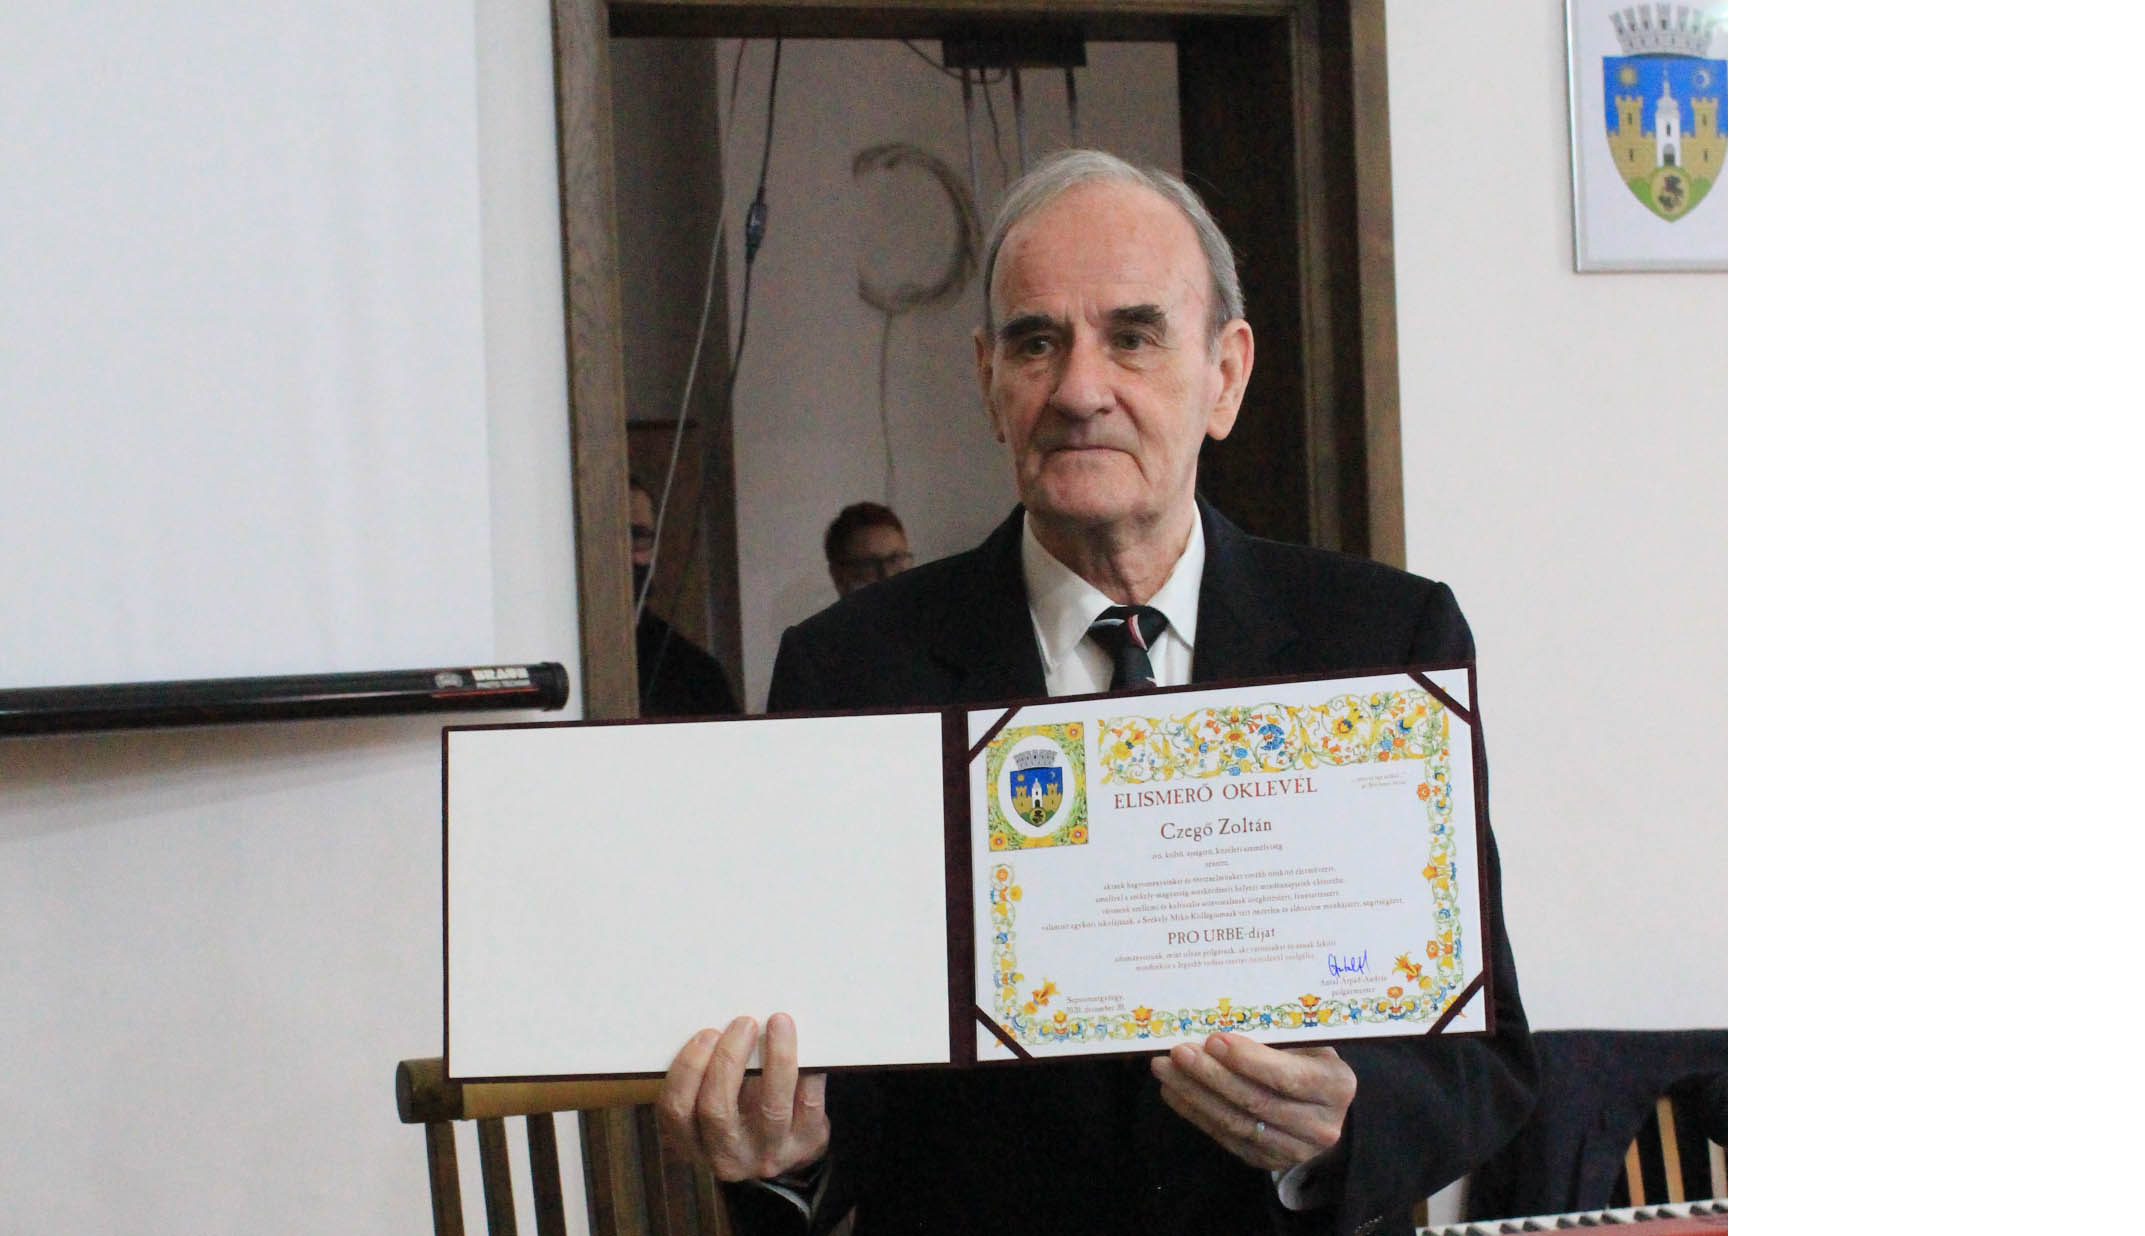 Átvette Czegő Zoltán a Pro Urbe díjat